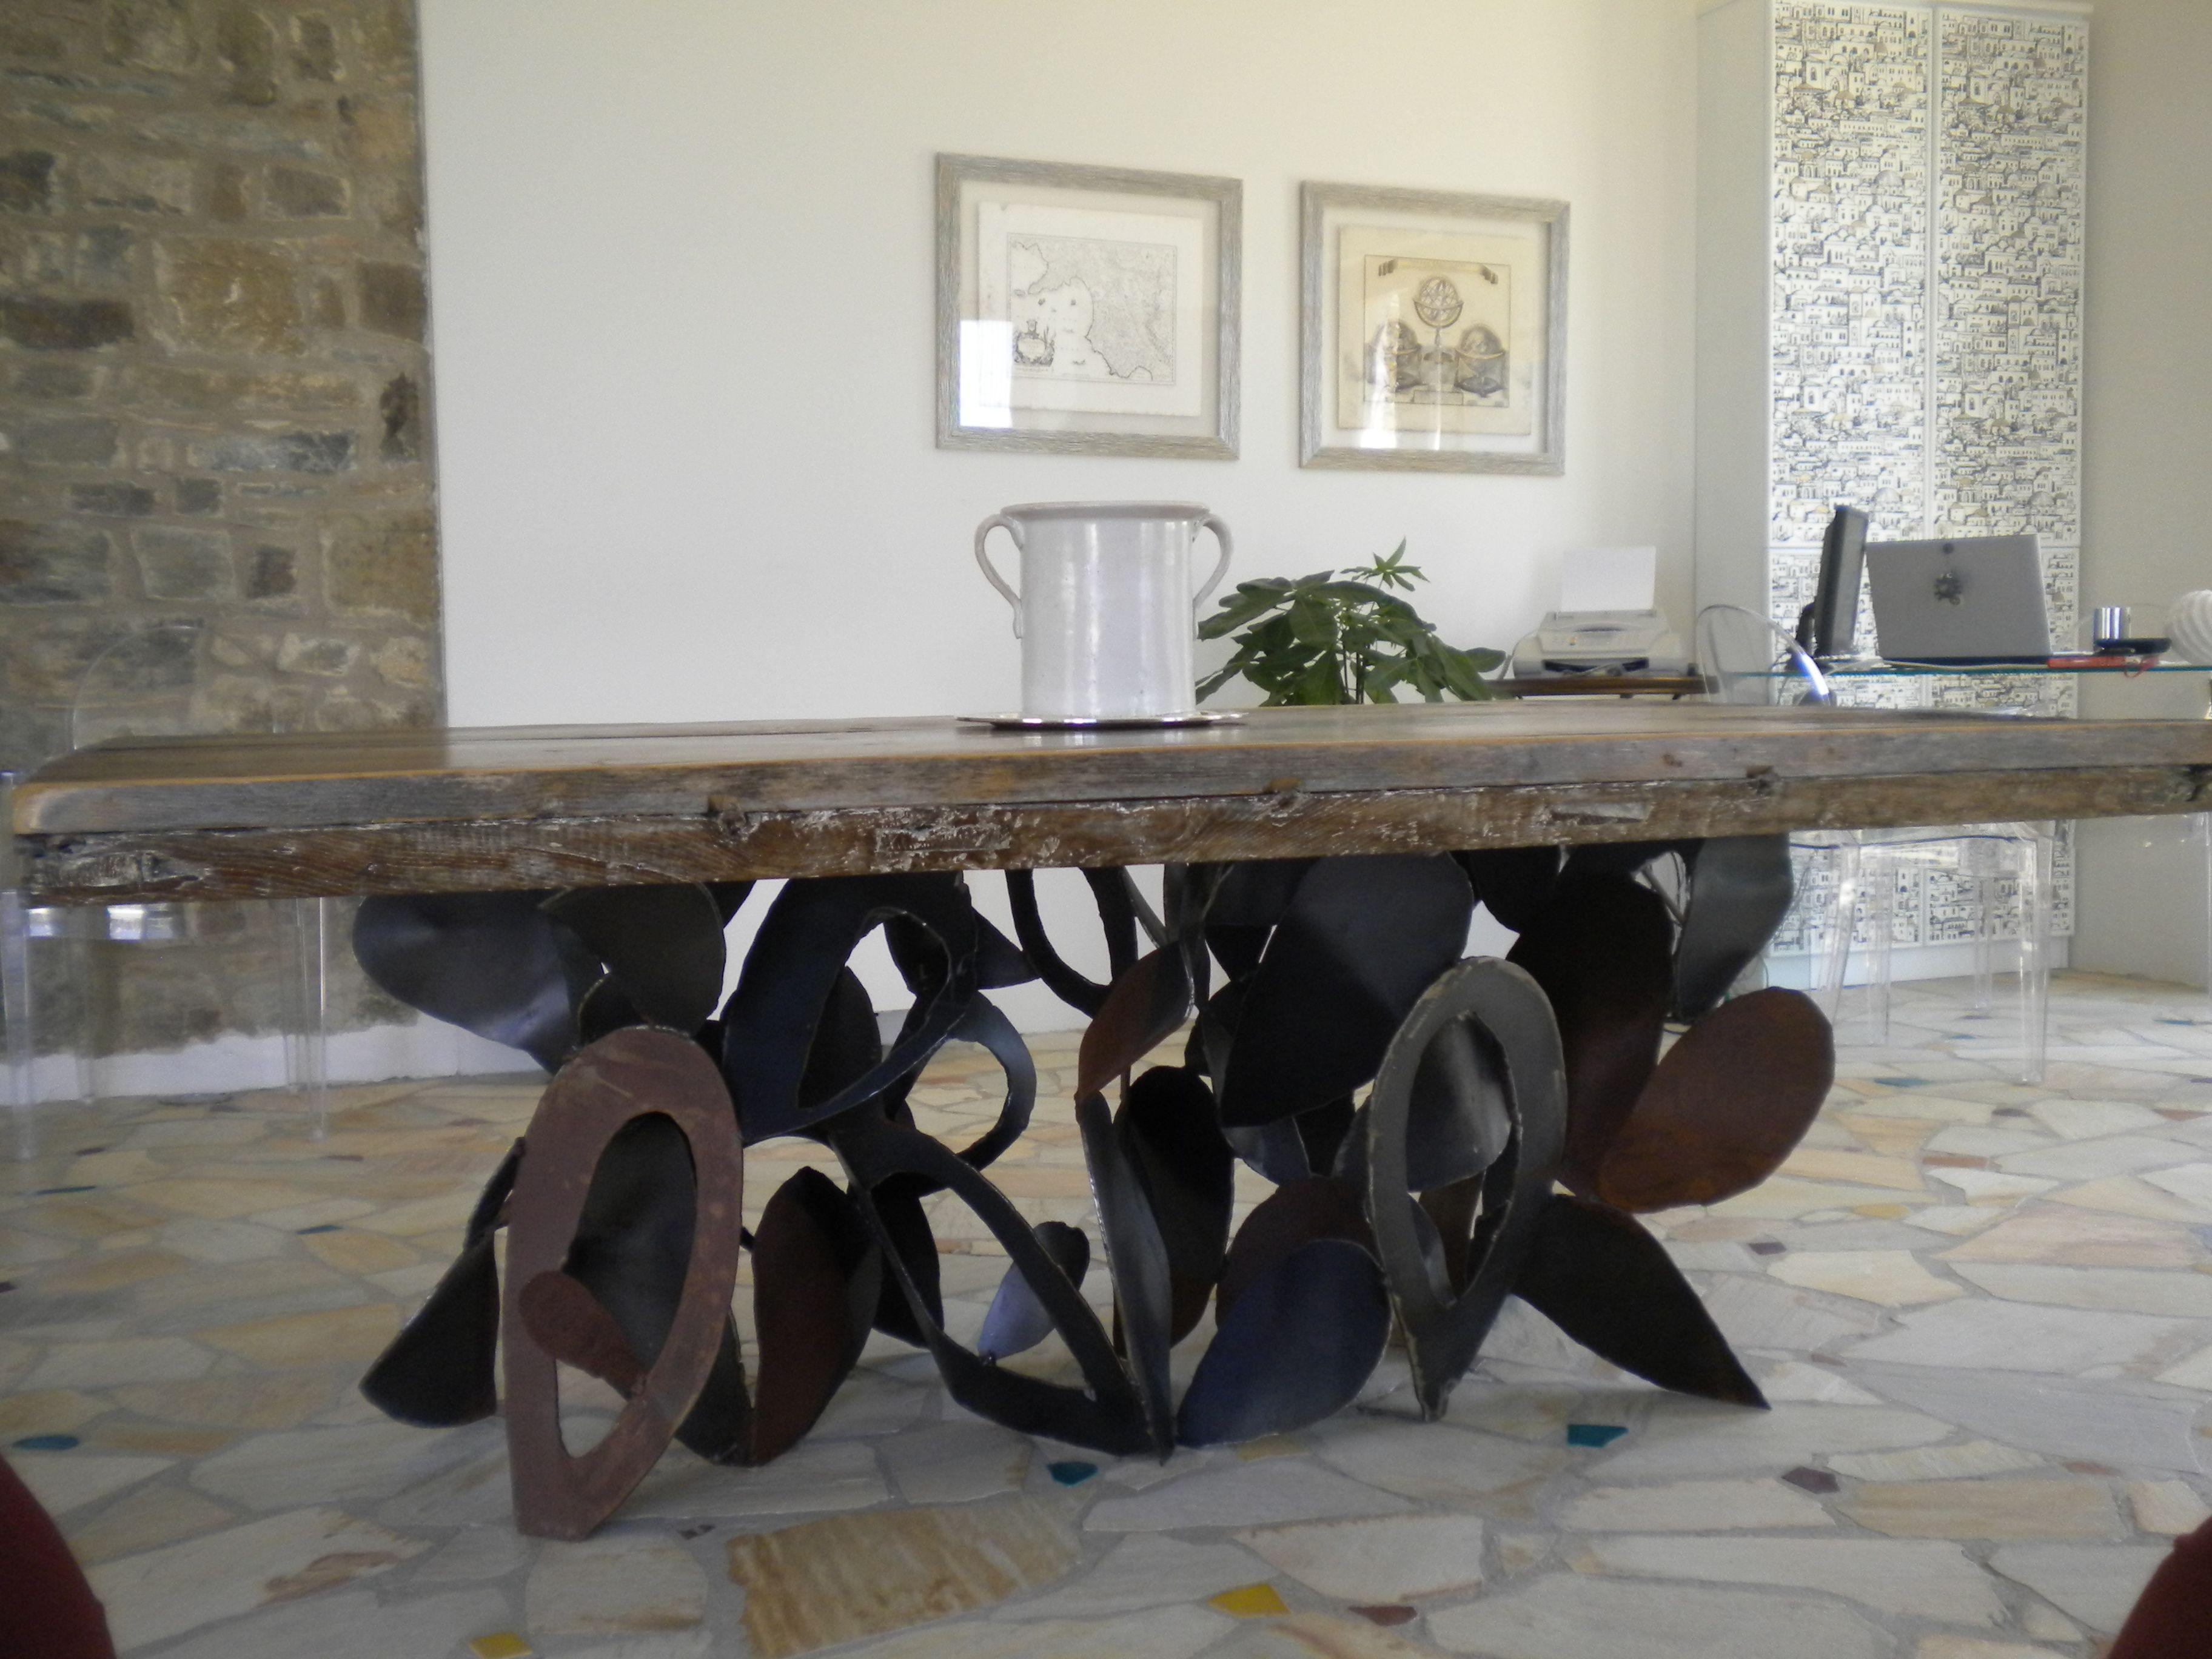 Tavolo Deco ~ Tavolo in legno e metallo wood and metal table table en bois